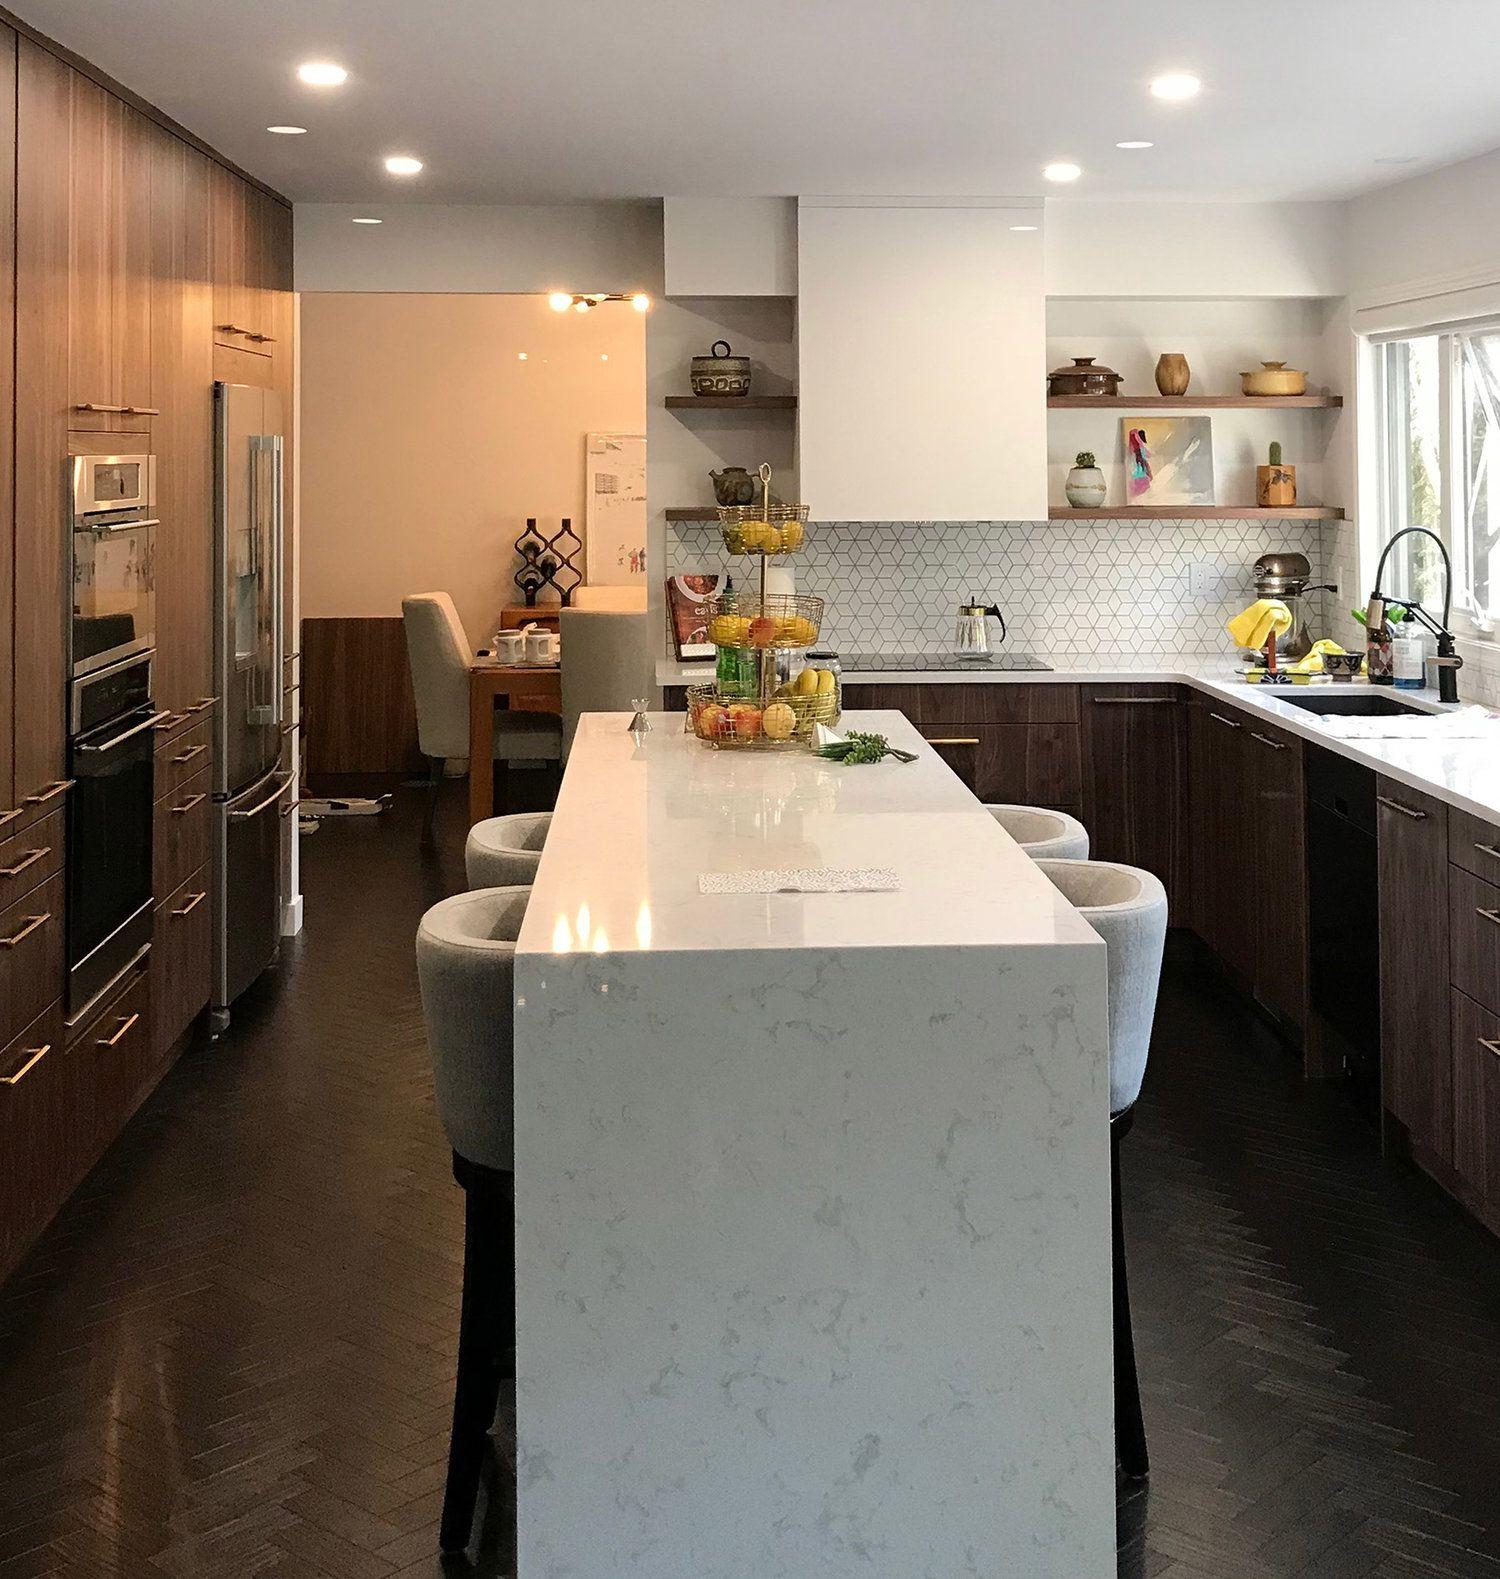 Style Slab Doors Finishes Perfect Sense Alpine White Domestic Wood Veneer Vertical Grain Walnut Kitch Design Kitchen Style Kitch Cabinets